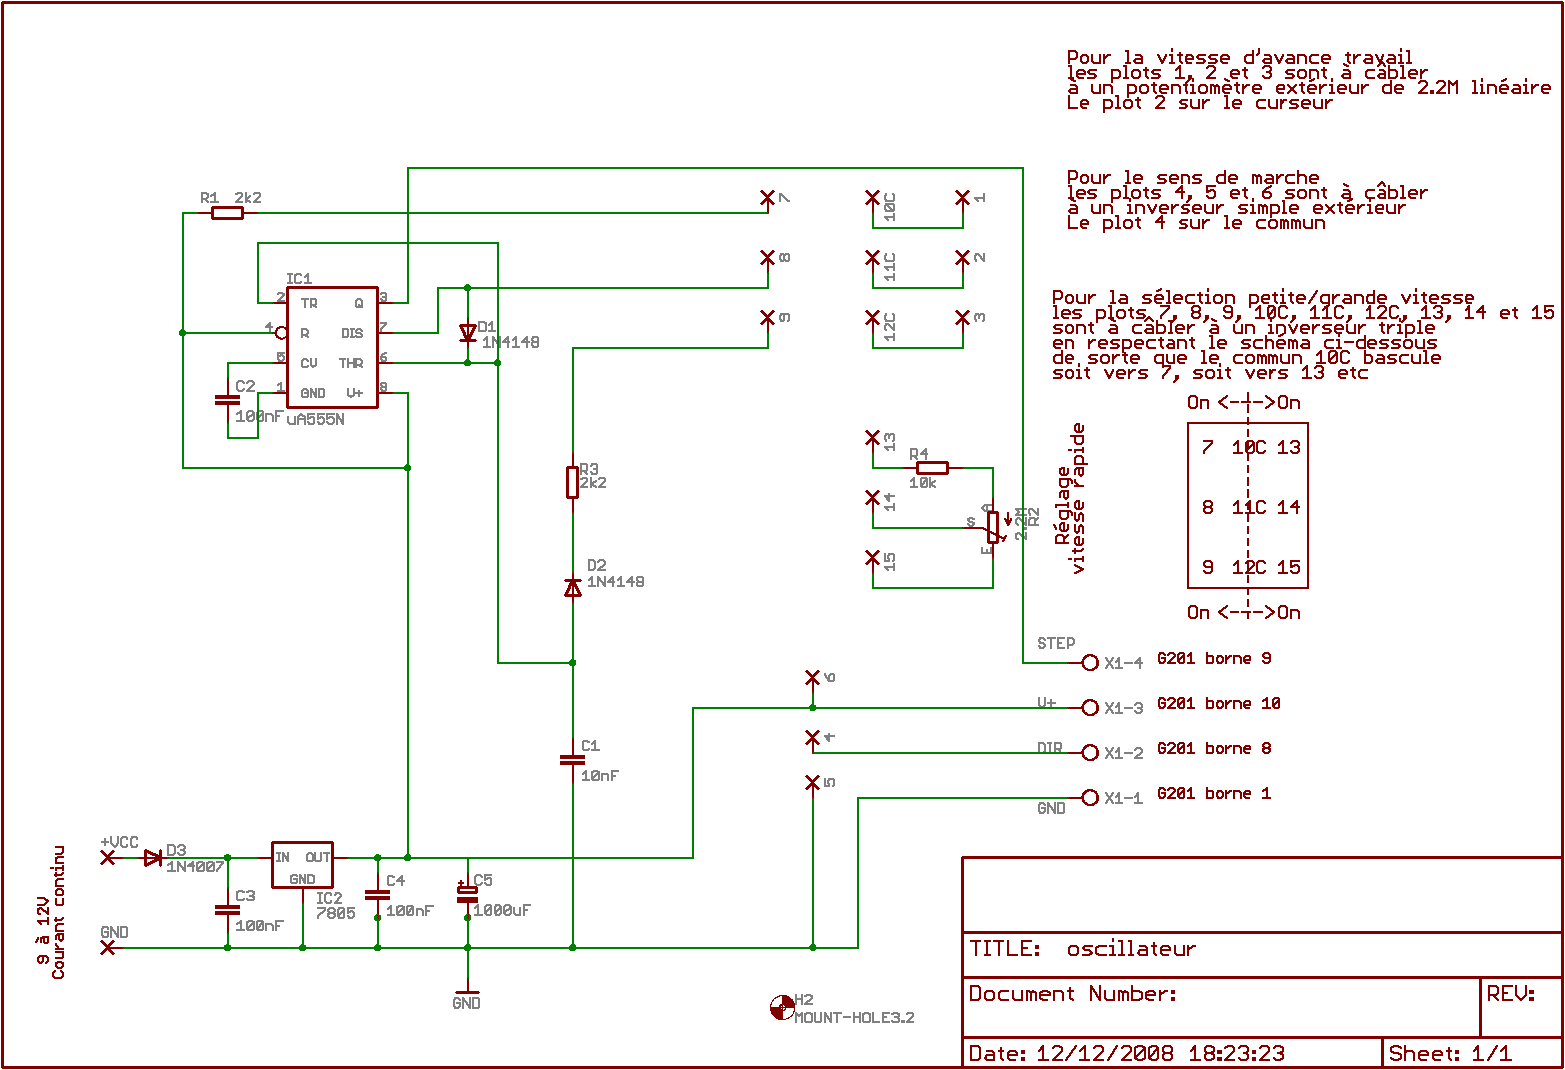 oscillateur_pierrel_schema.png